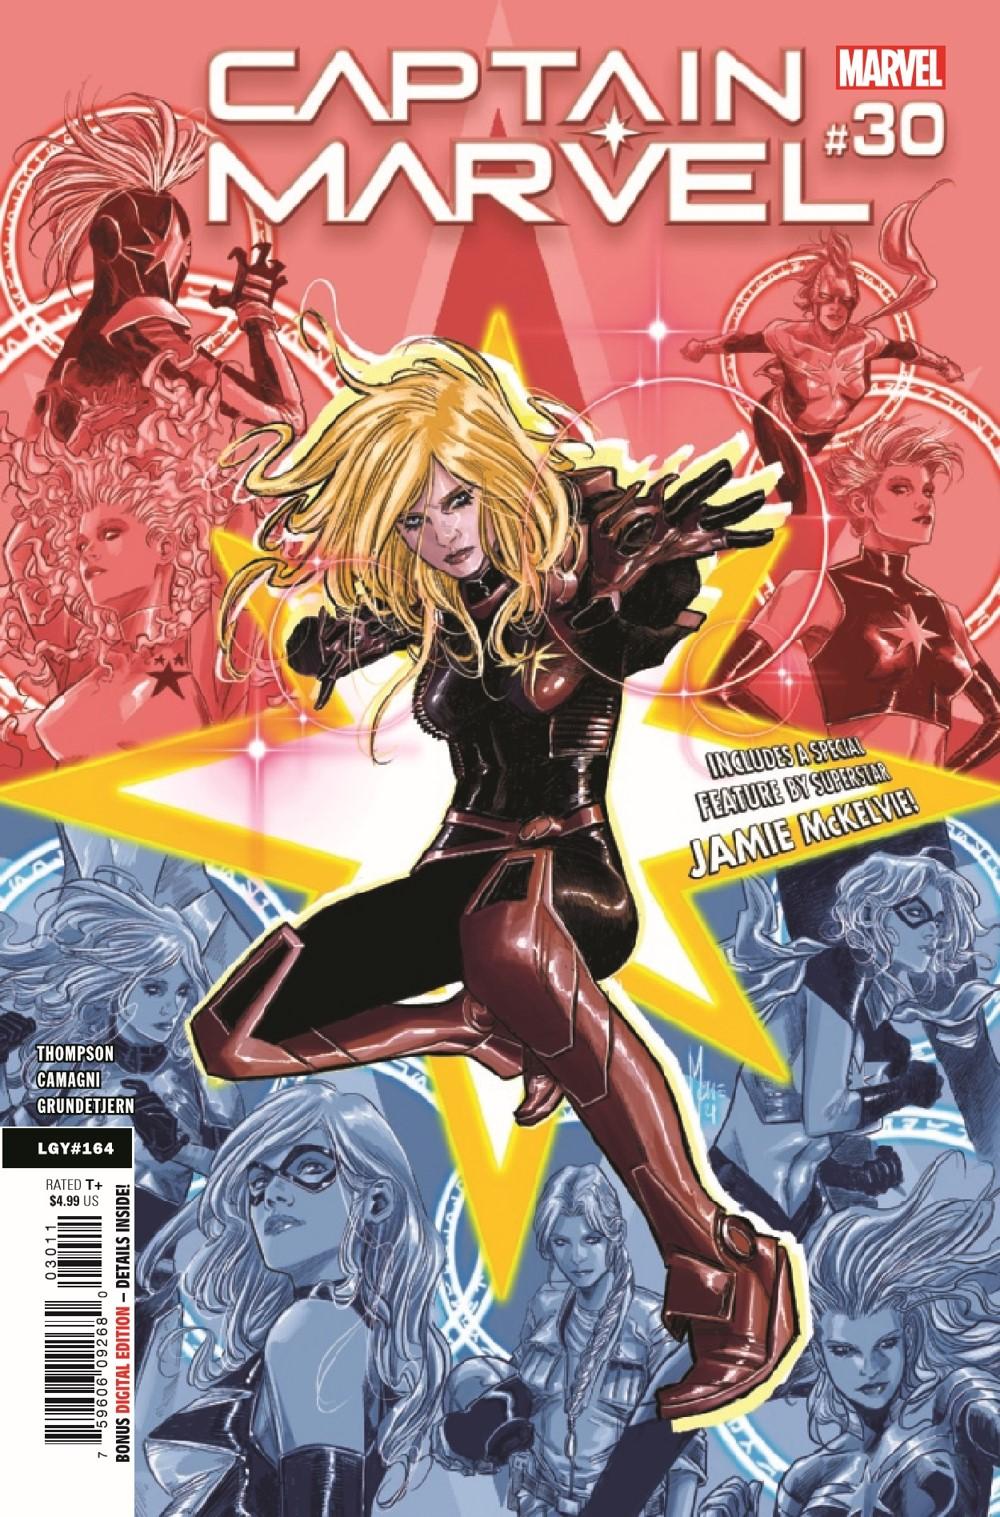 CAPMARV2019030_Preview-1 ComicList Previews: CAPTAIN MARVEL #30